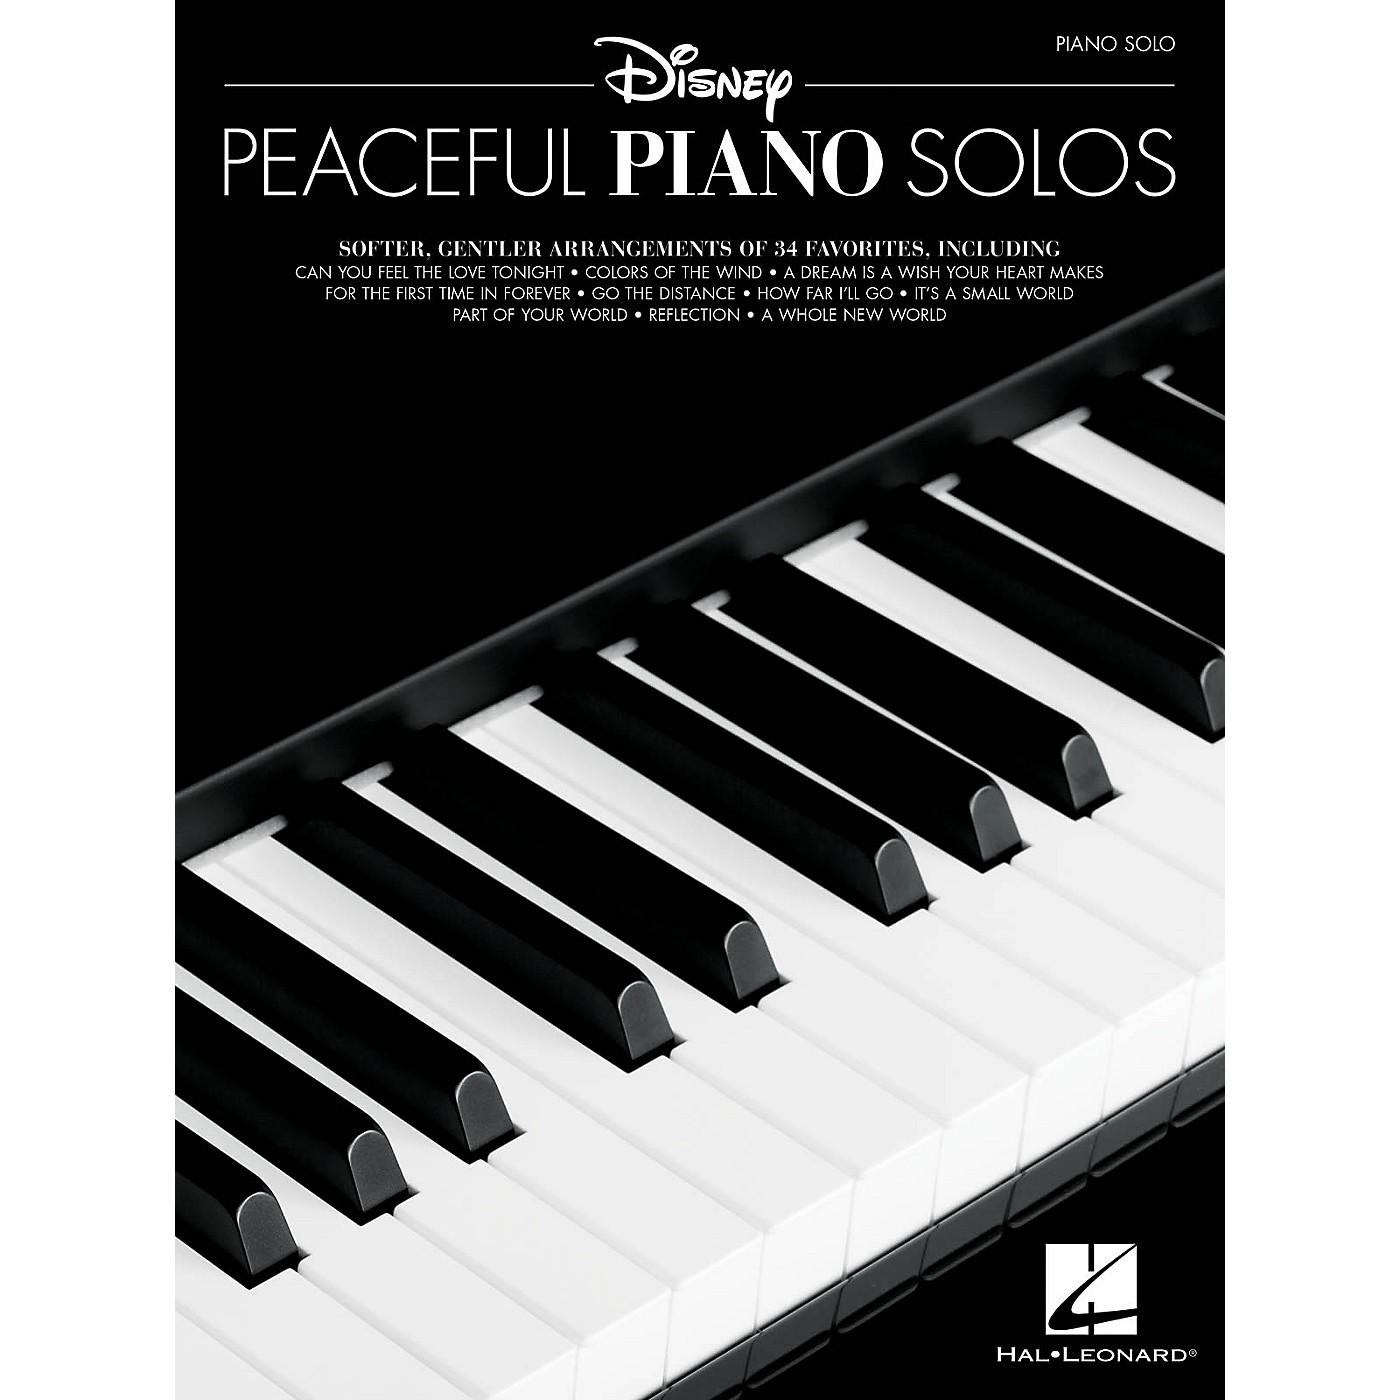 Hal Leonard Disney Peaceful Piano Solos - Piano Solo Songbook thumbnail